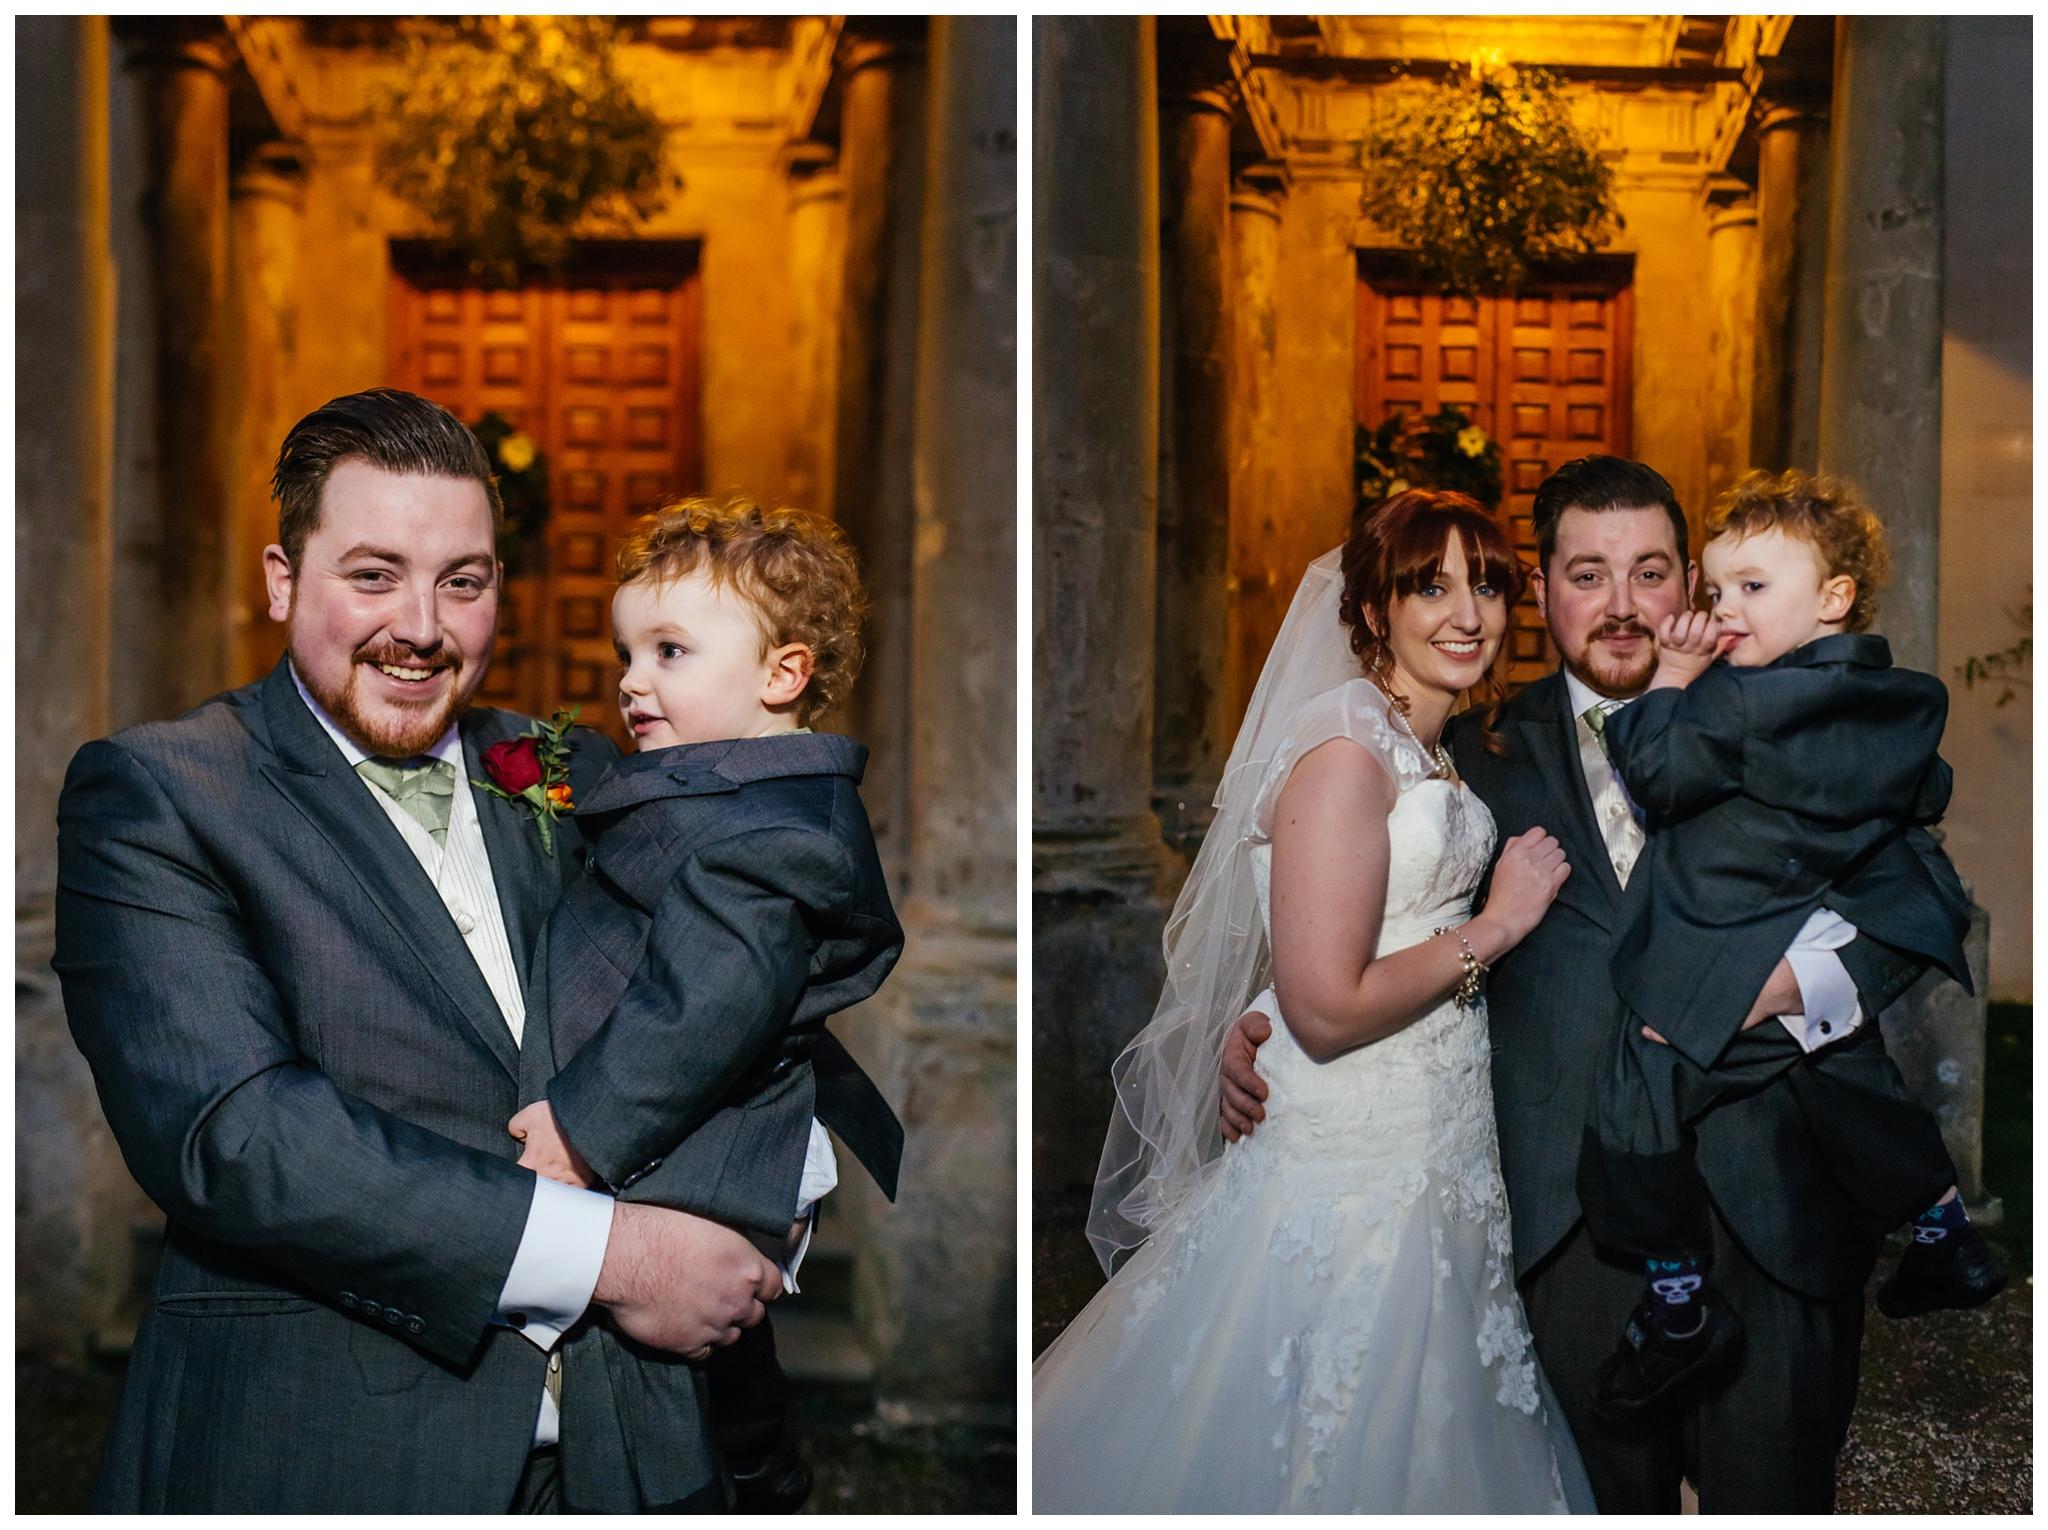 Emma&Paul-Elmore-Court-Winter-Wedding-Nikki-Cooper-Photography_0080.jpg